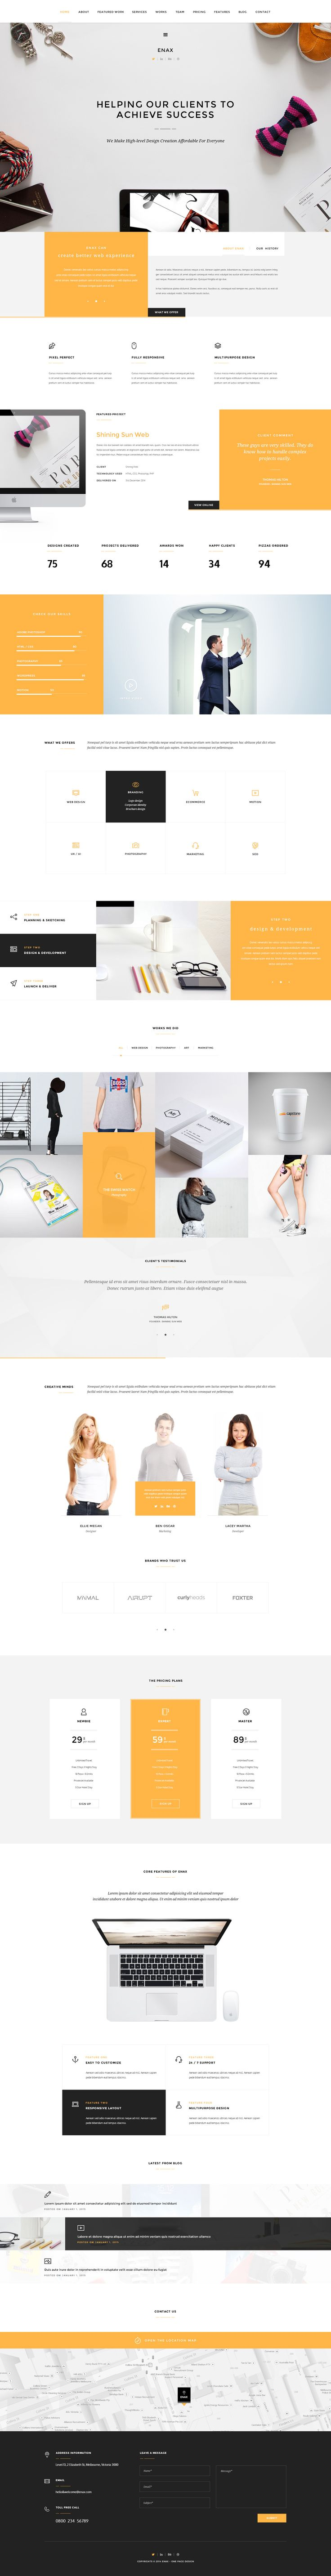 #Hariswebdesign, #Webdesigner, #Website, #HarisKarat, www.harisw.com Cool Web Design, #webdesign #design #theme